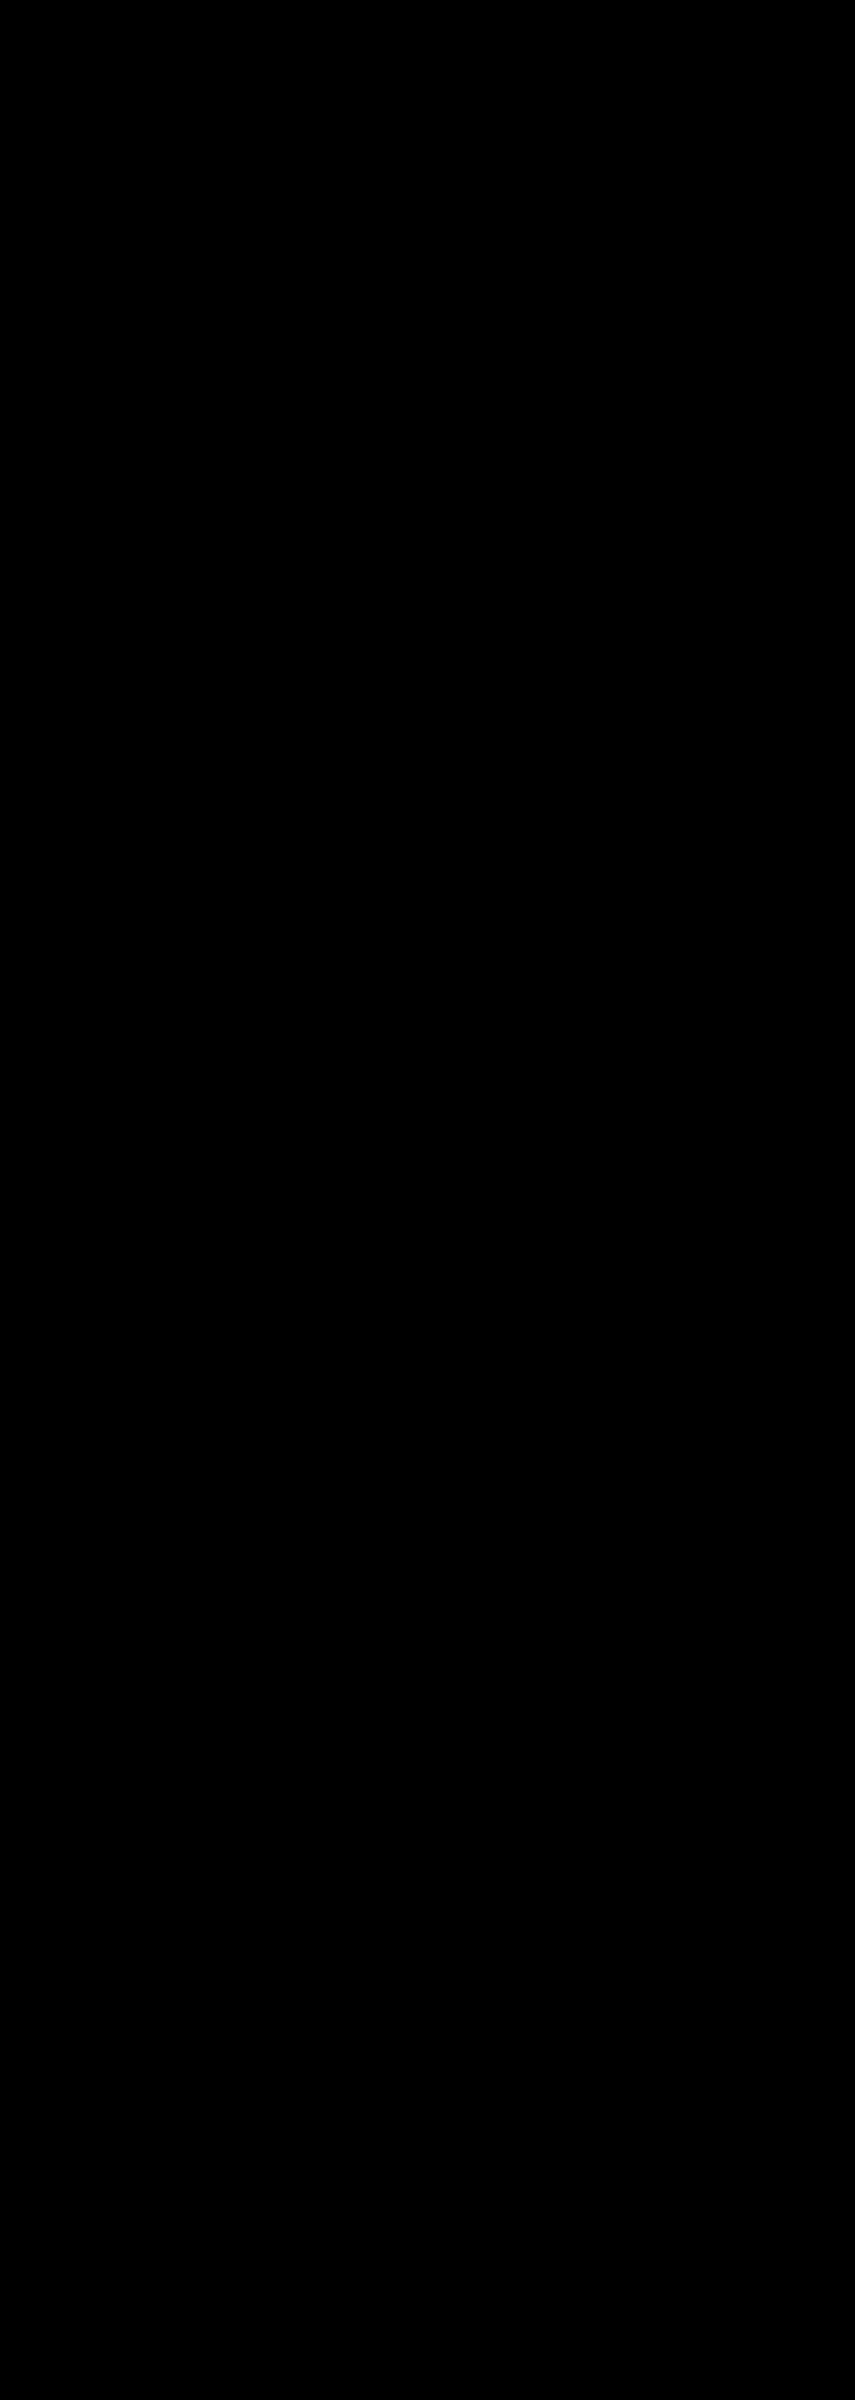 Clipart - Scroll frame